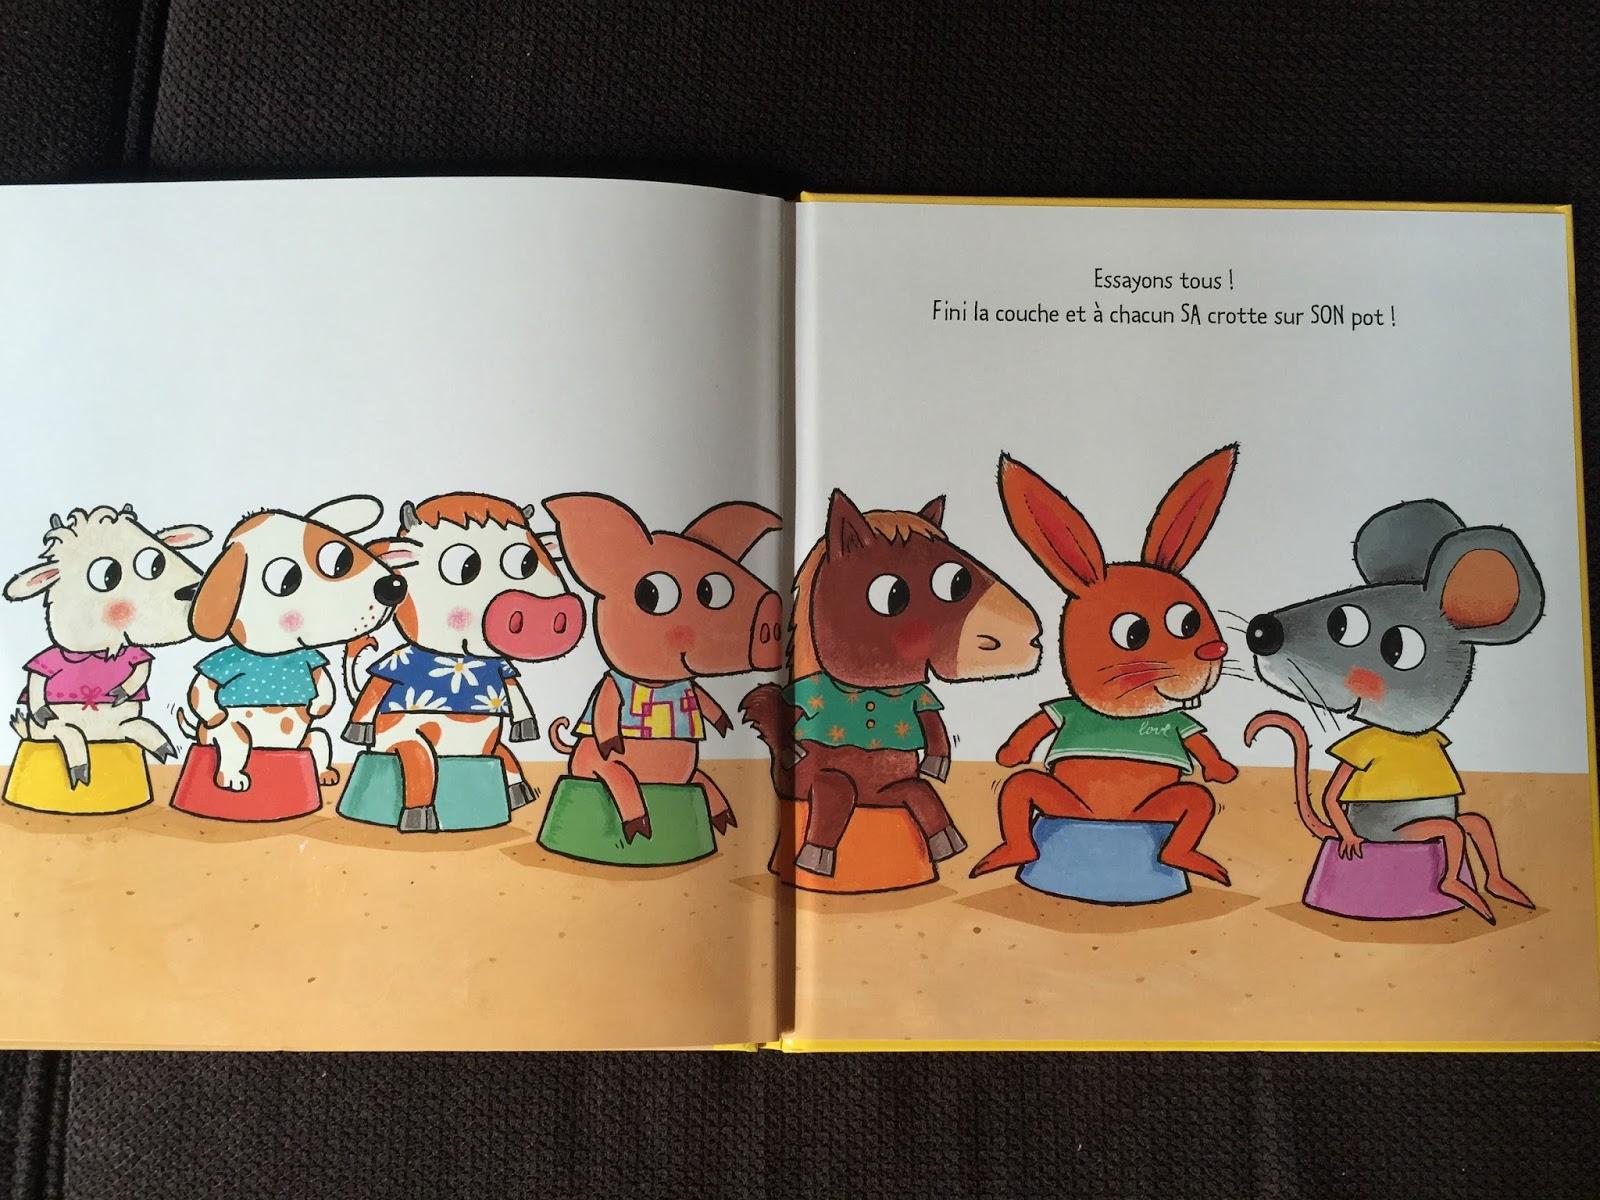 un b 233 b 233 231 a change la vie qu y a t il dans ta couche chut les enfants lisent